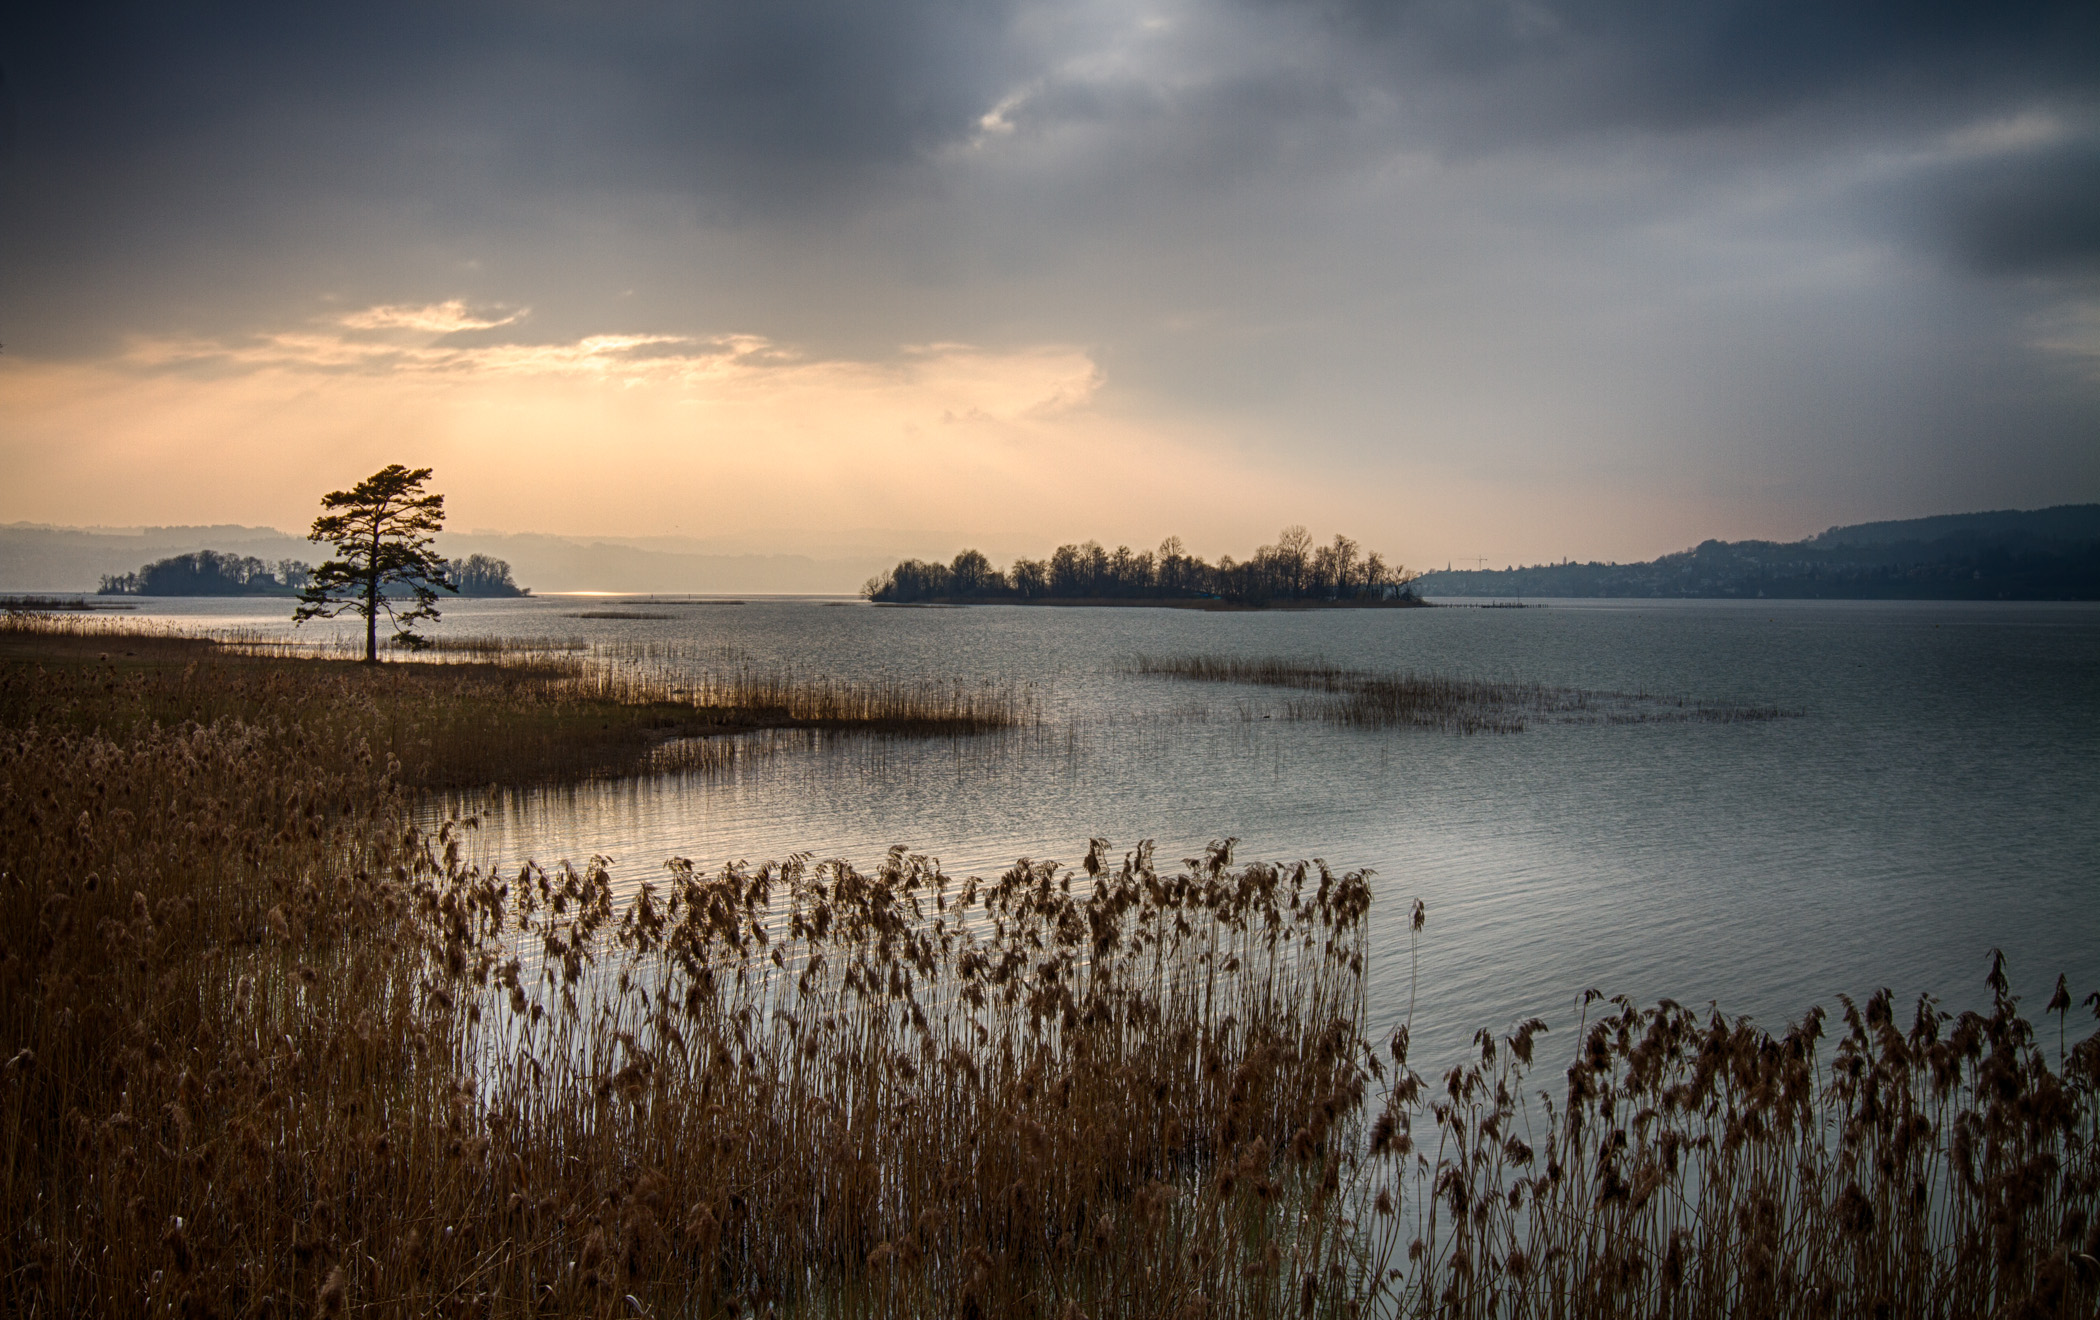 mikebite-landscape-photography-3.jpg